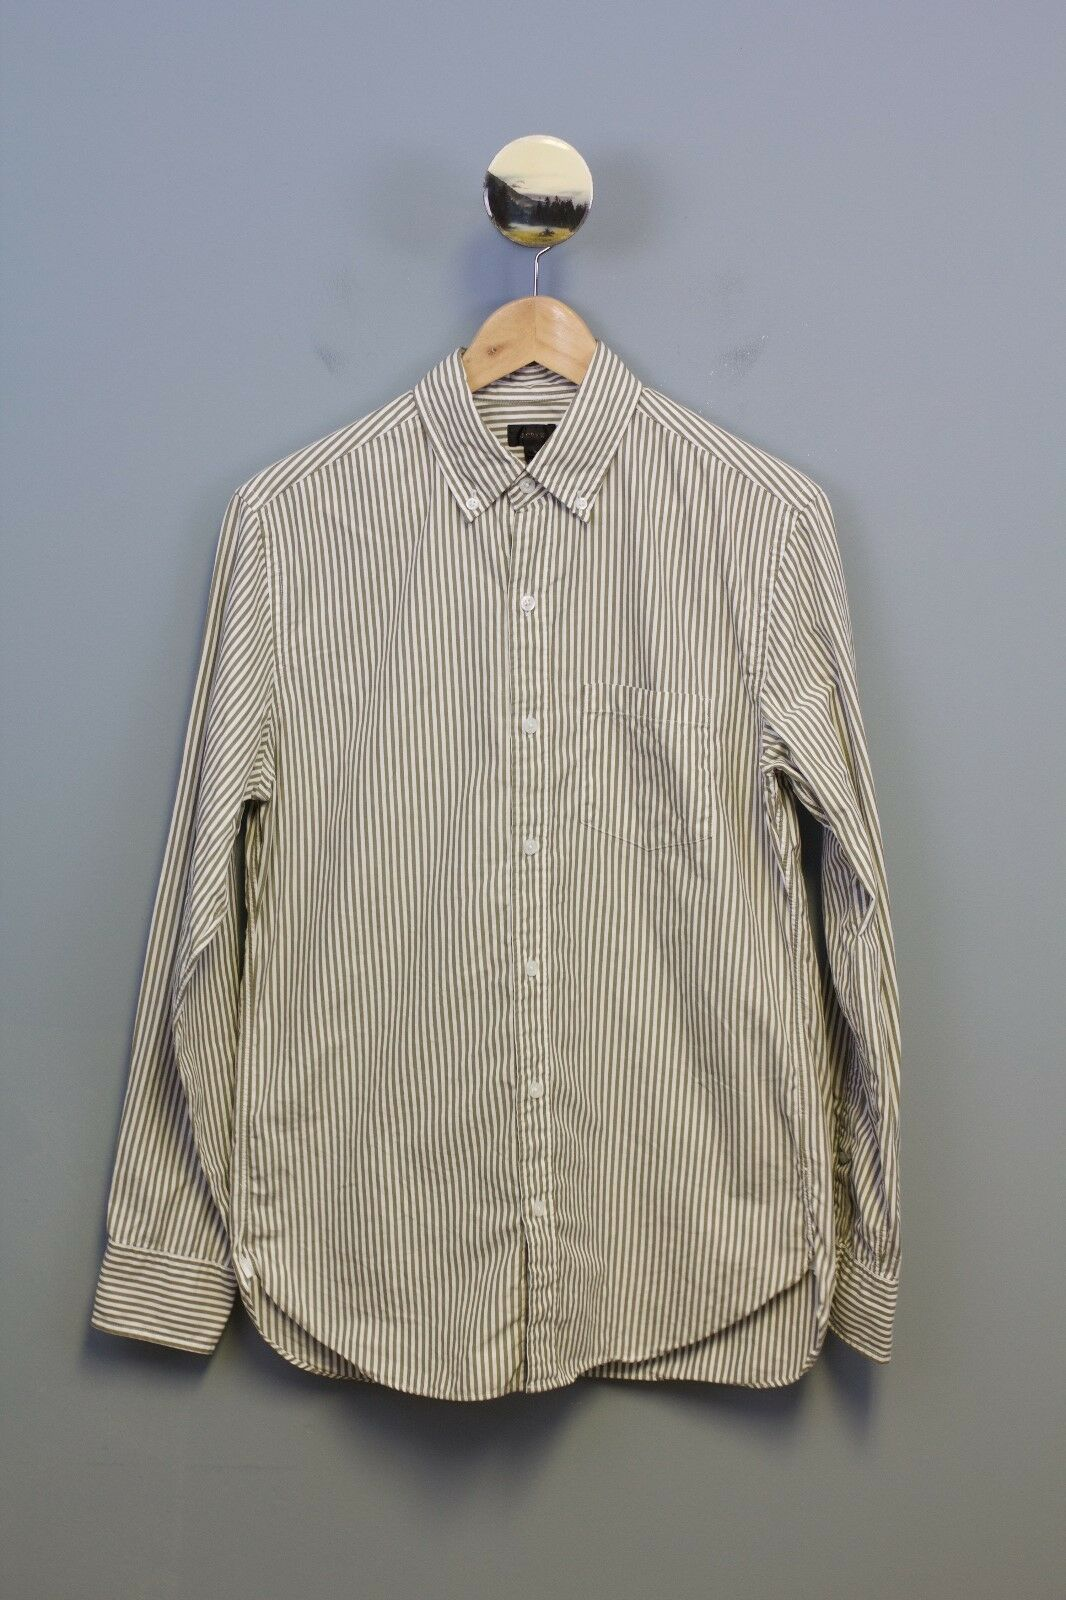 J Crew Men's Secret Wash Long Sleeve Shirt Size Small Retail  Item B4315